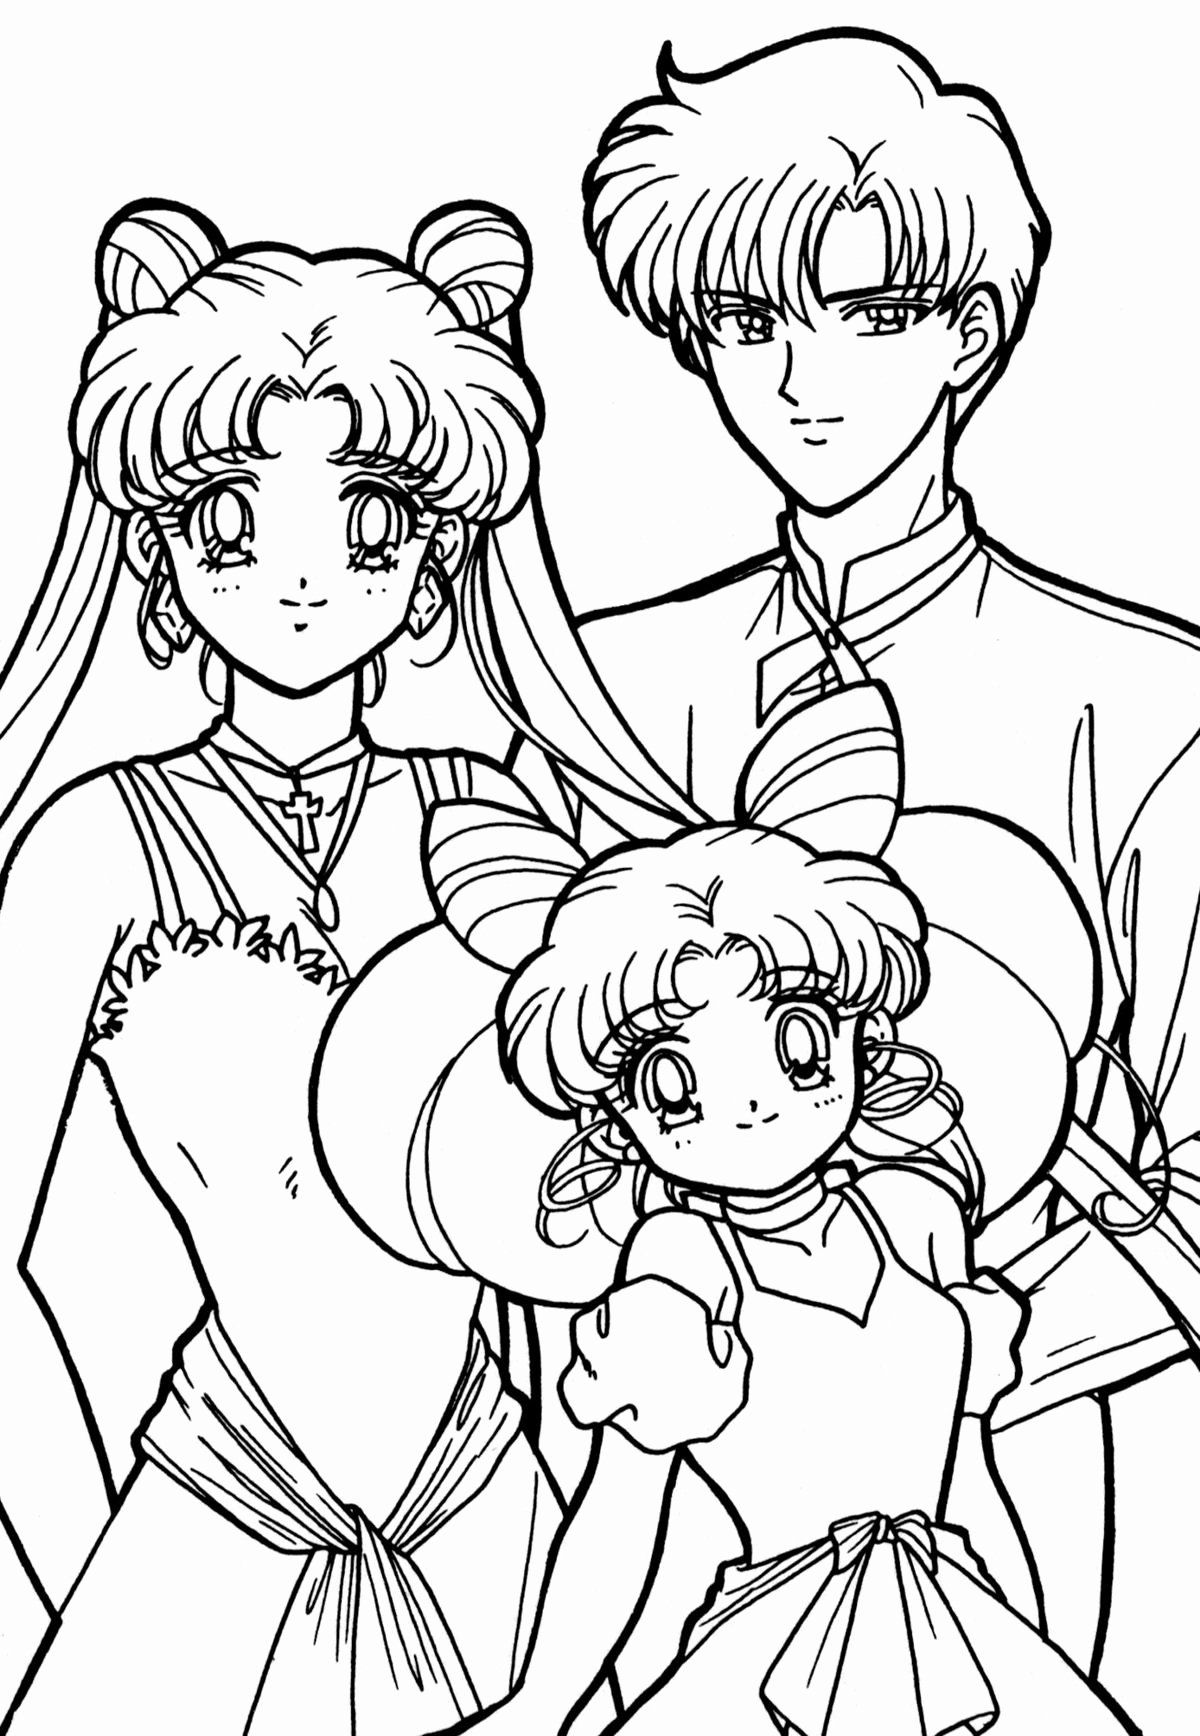 Sailor Moon Coloring Book Luxury Usagi Mamoru And Chibiusa Coloring Page Sailormoon Sailor Moon Coloring Pages Moon Coloring Pages Coloring Books